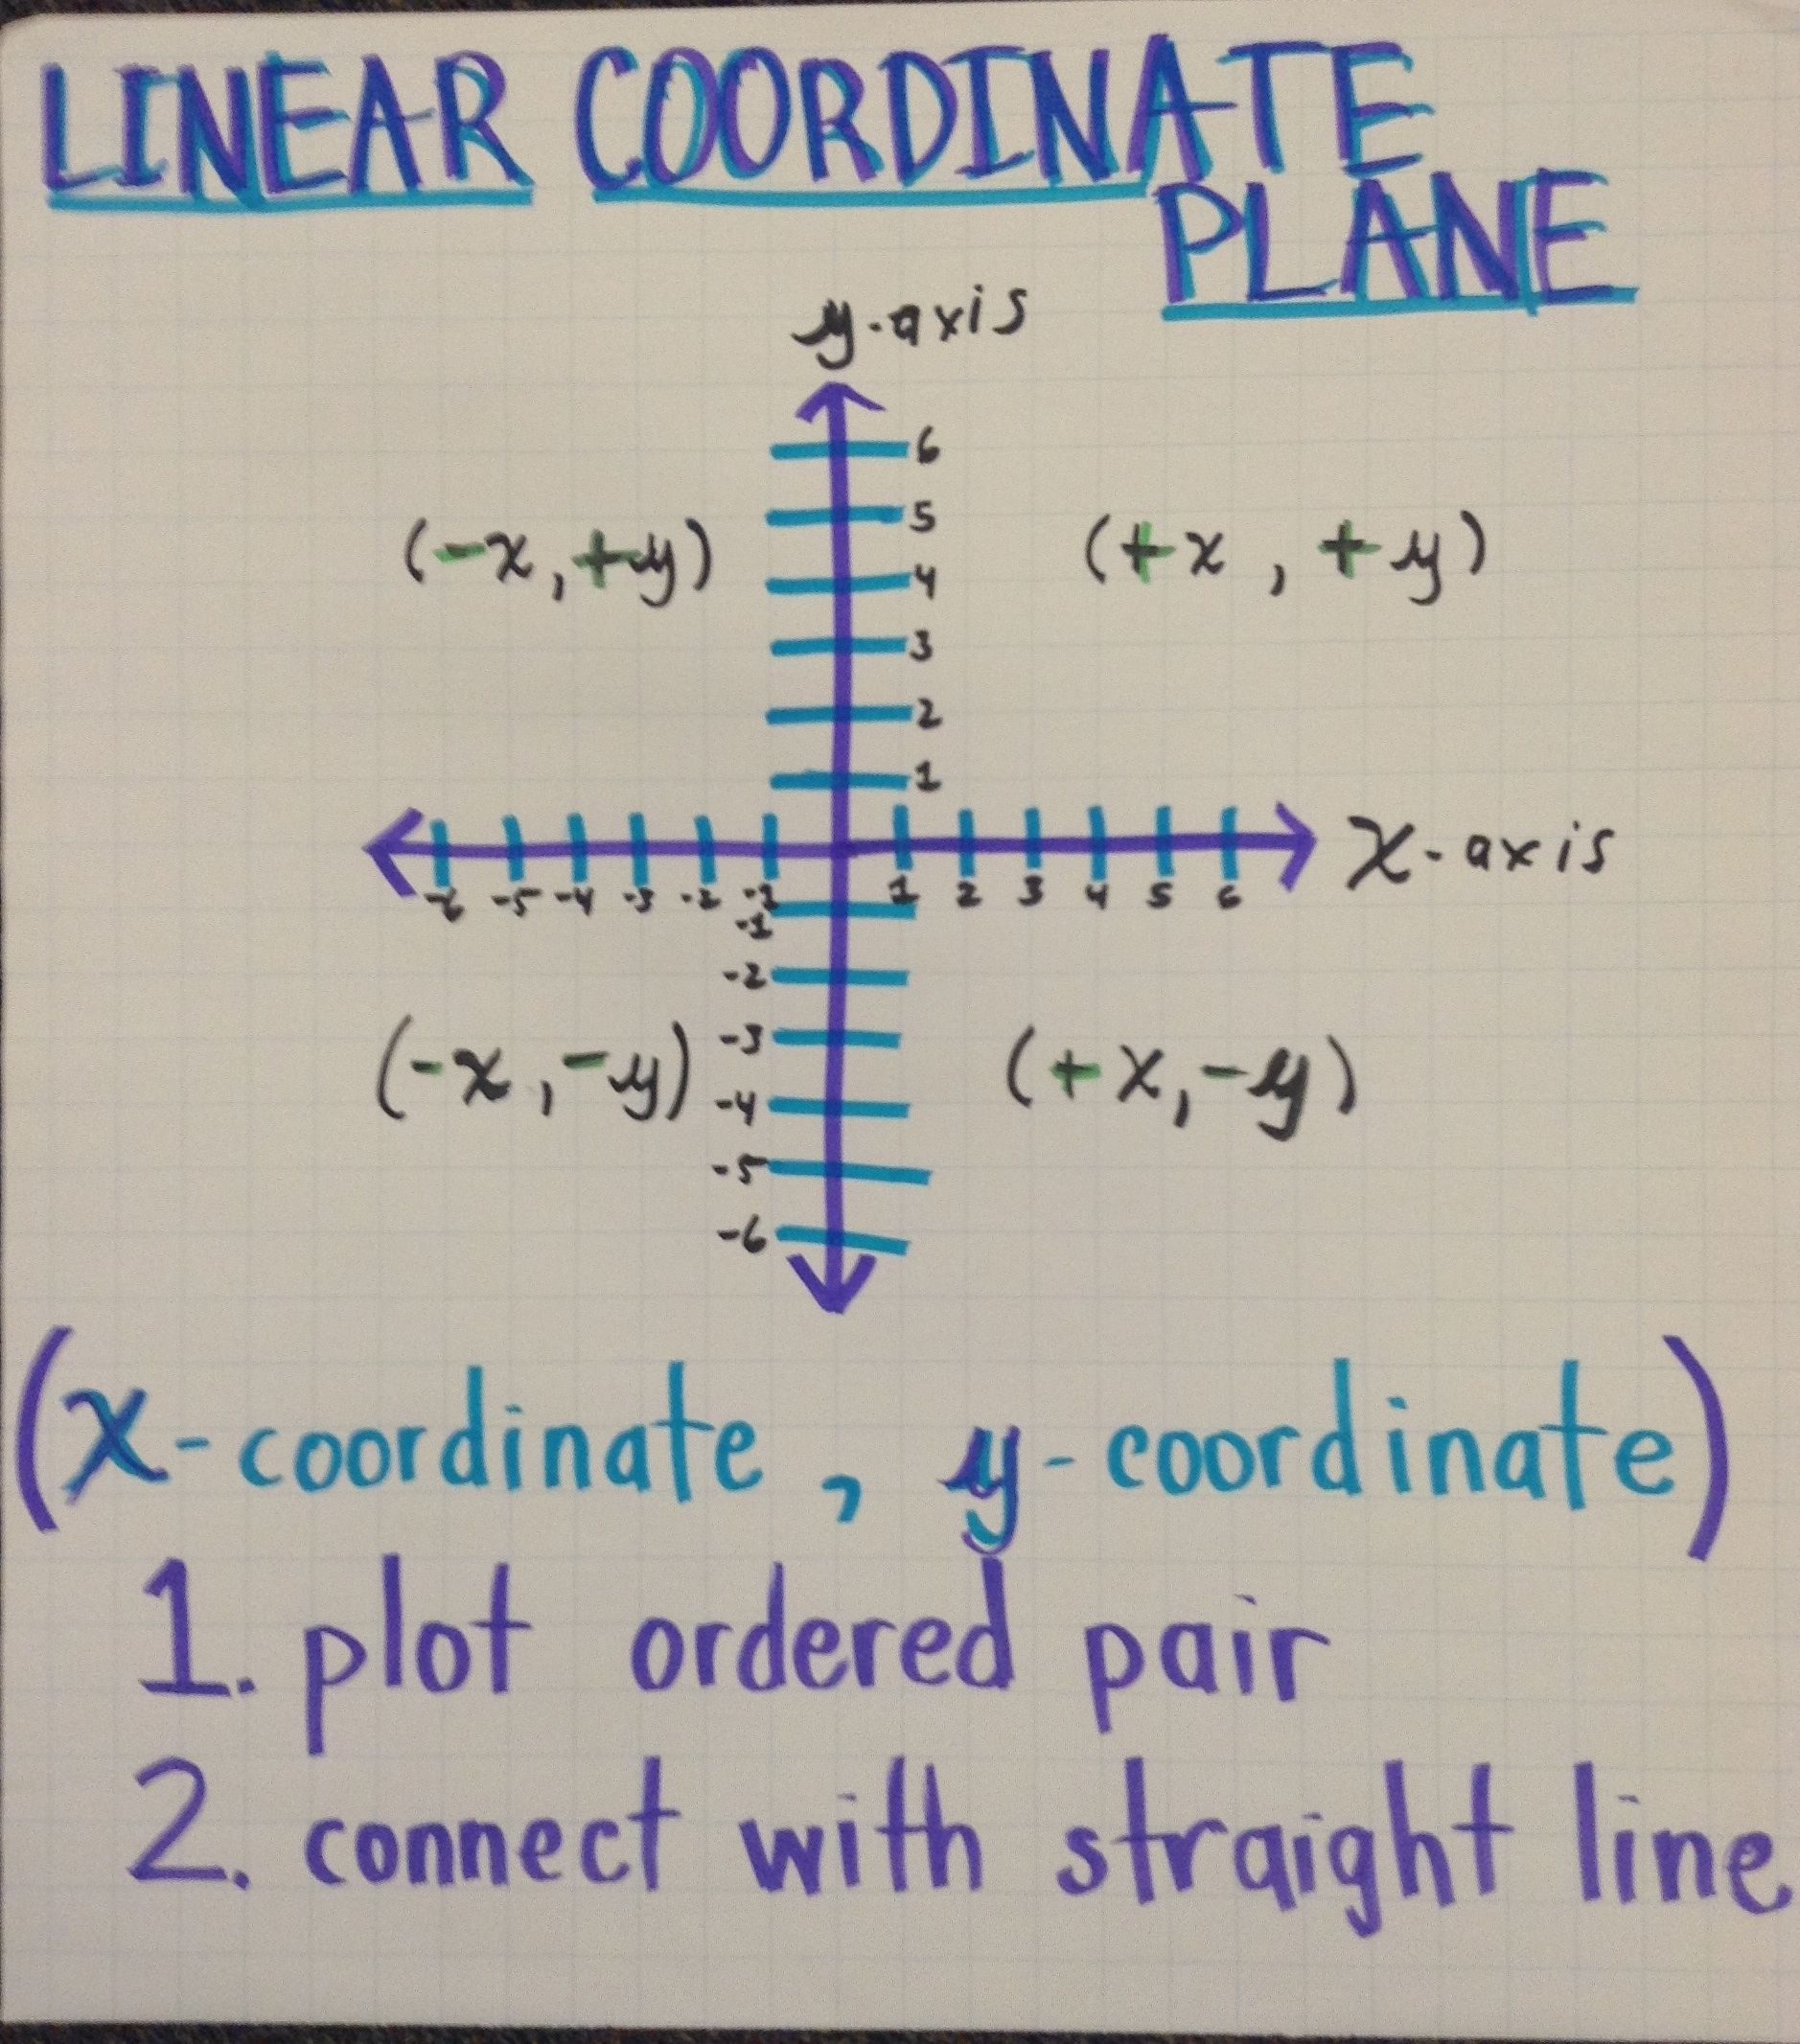 Linear Coordinate Plane